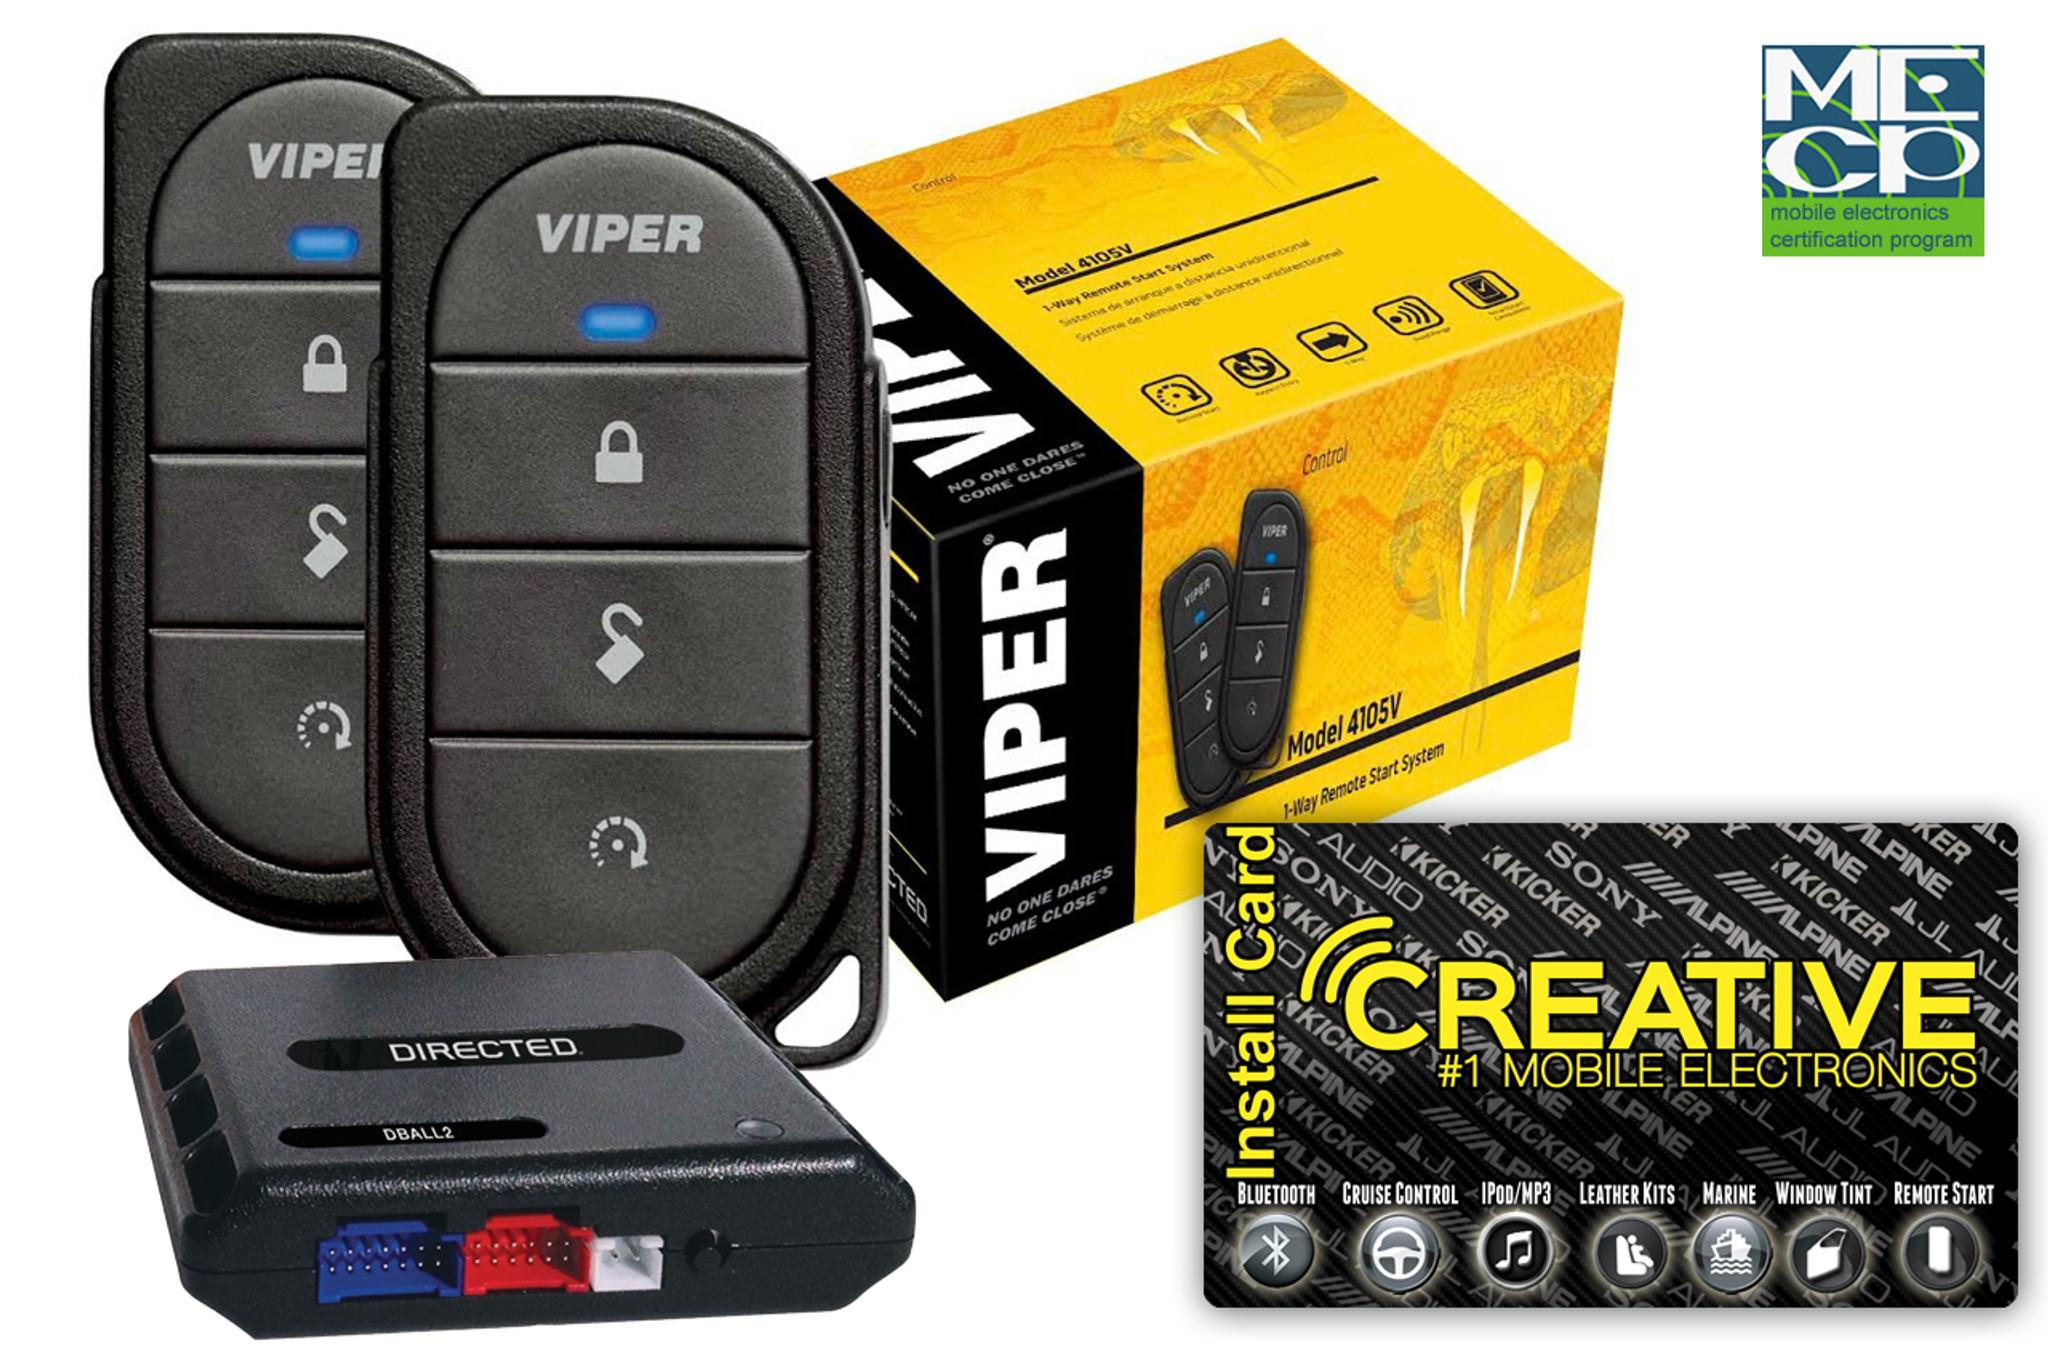 hight resolution of viper 1002 wiring diagram wiring diagrams lol viper auto start alarm viper 5704 wiring diagram